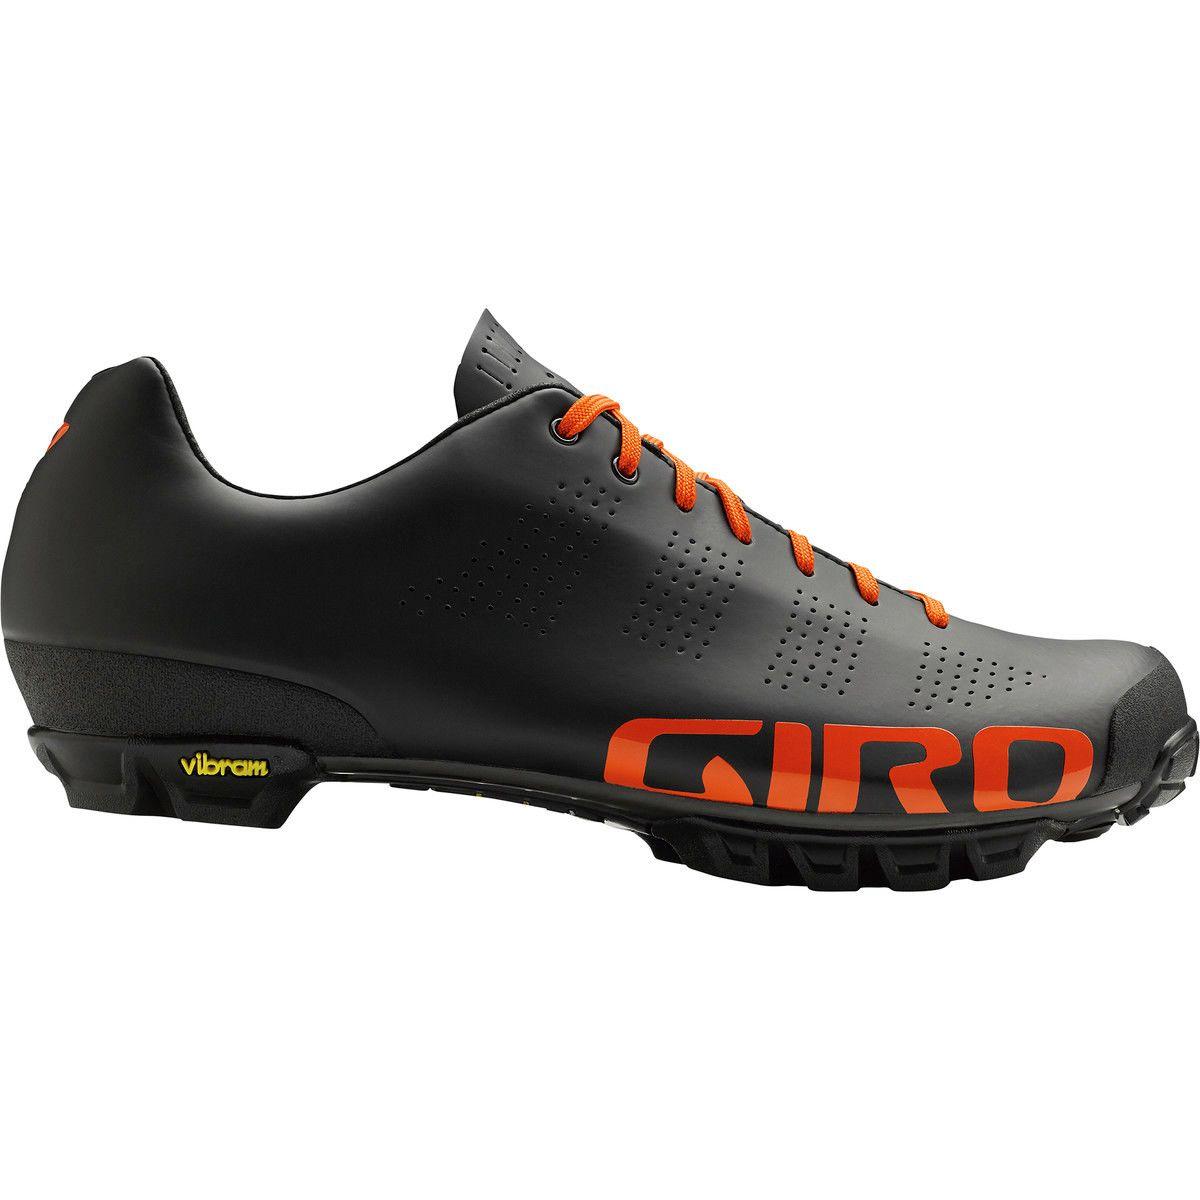 1e7fd81fd97845 Giro Empire VR90 Cycling Shoe - Men s